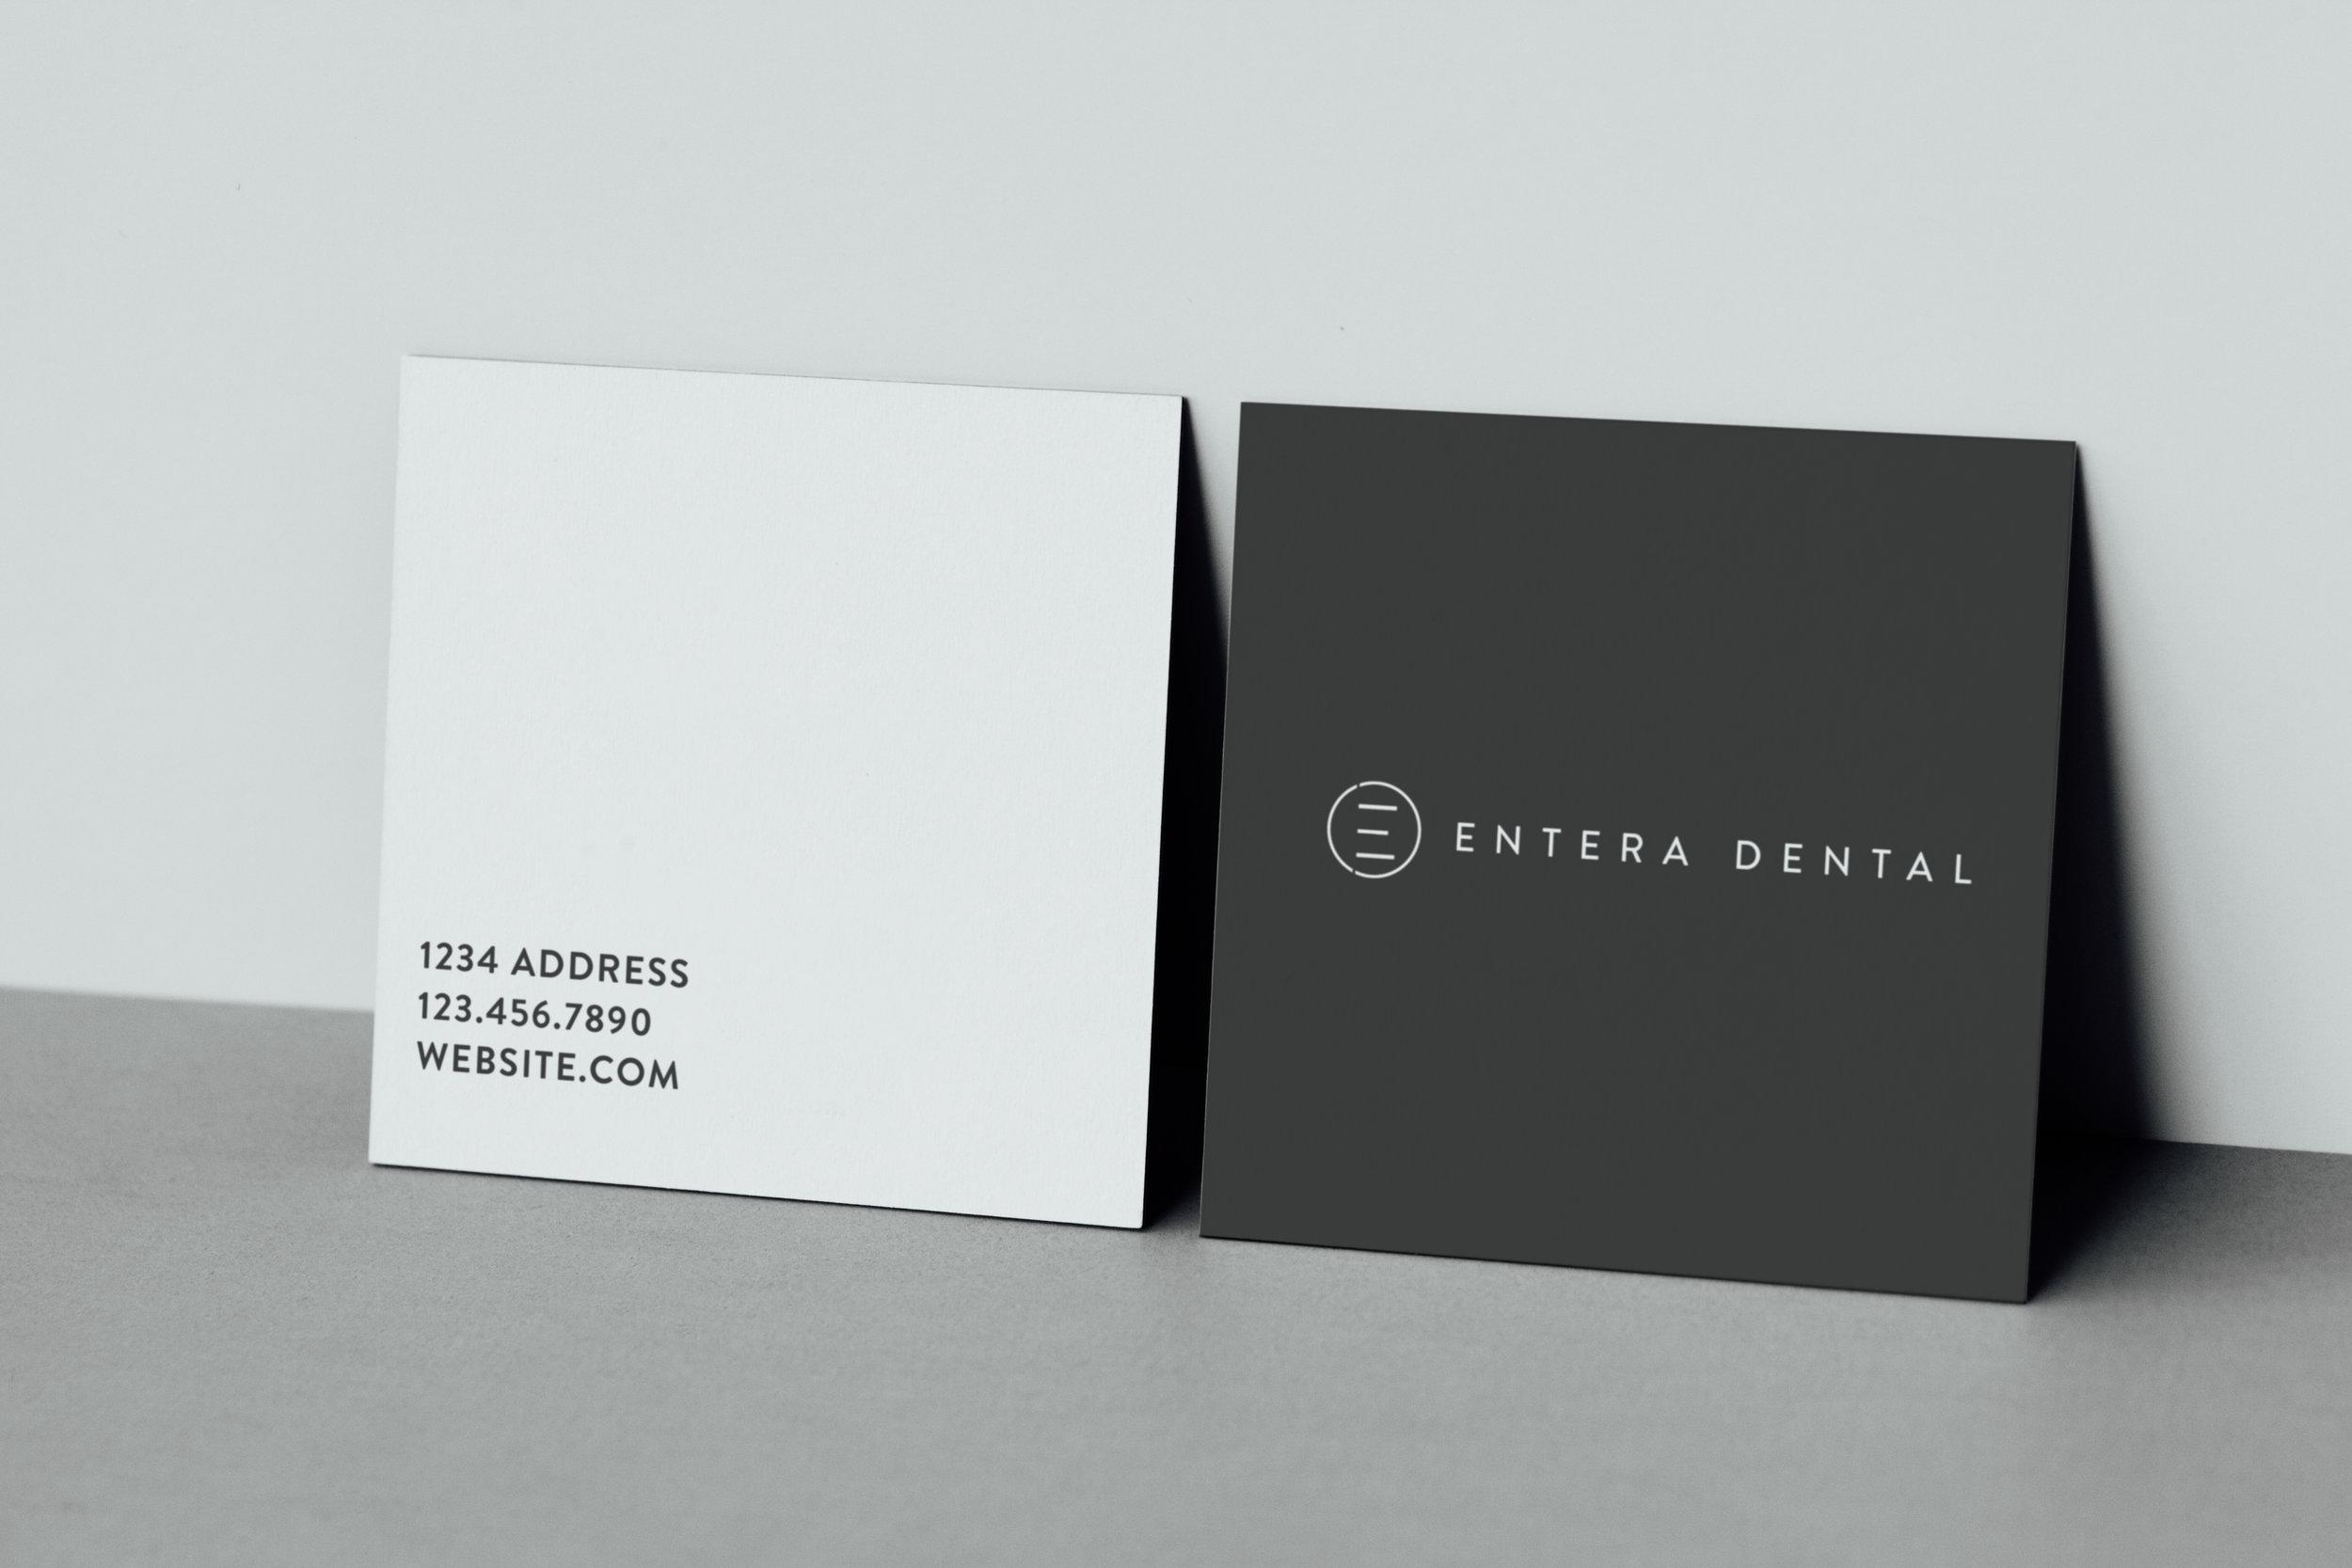 businesscard mockup.jpg